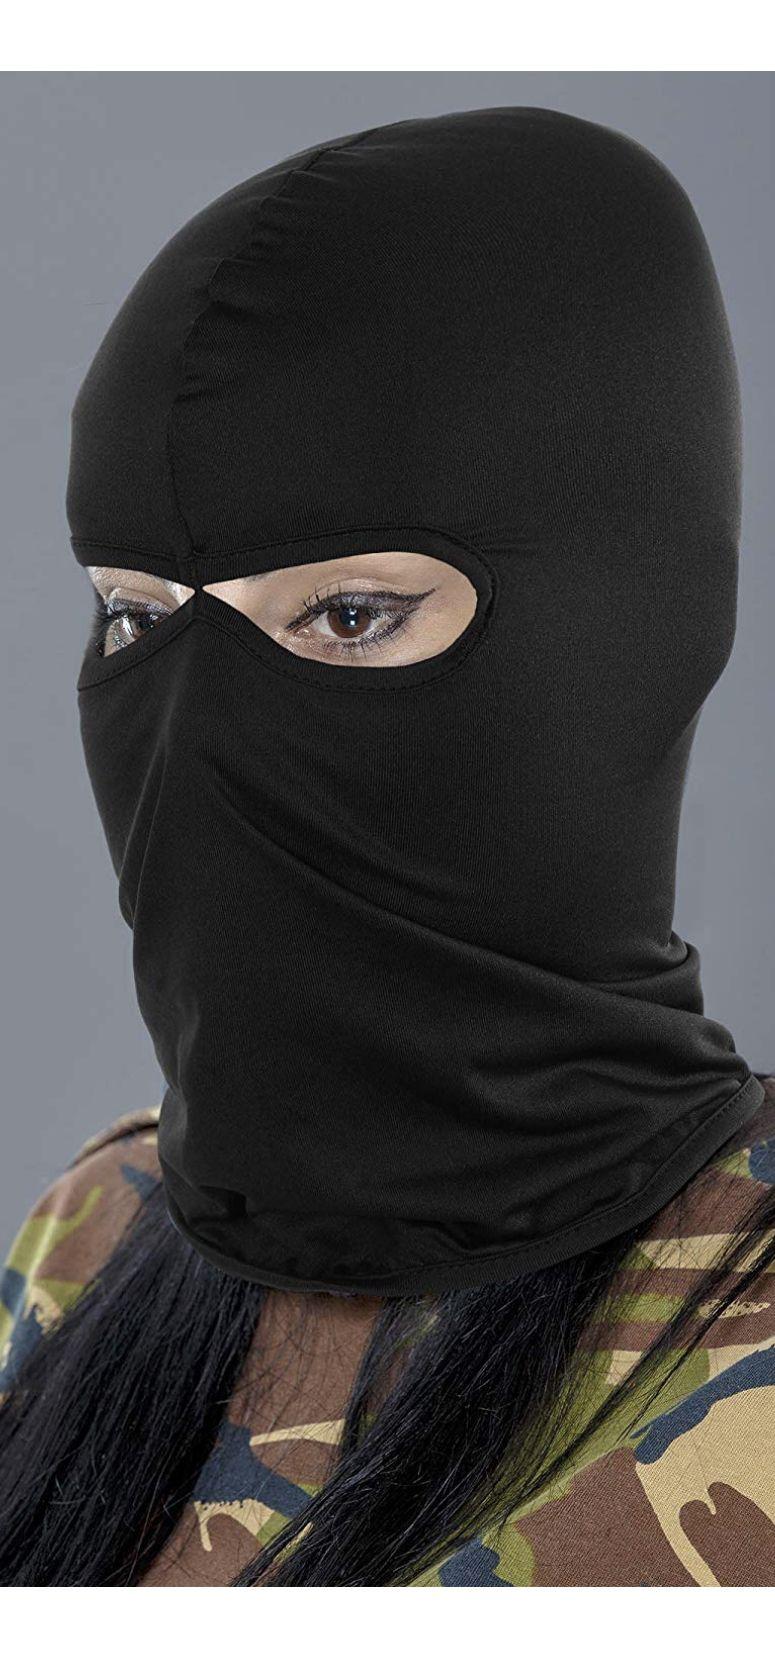 9df23a87f3e Pin on ski mask female